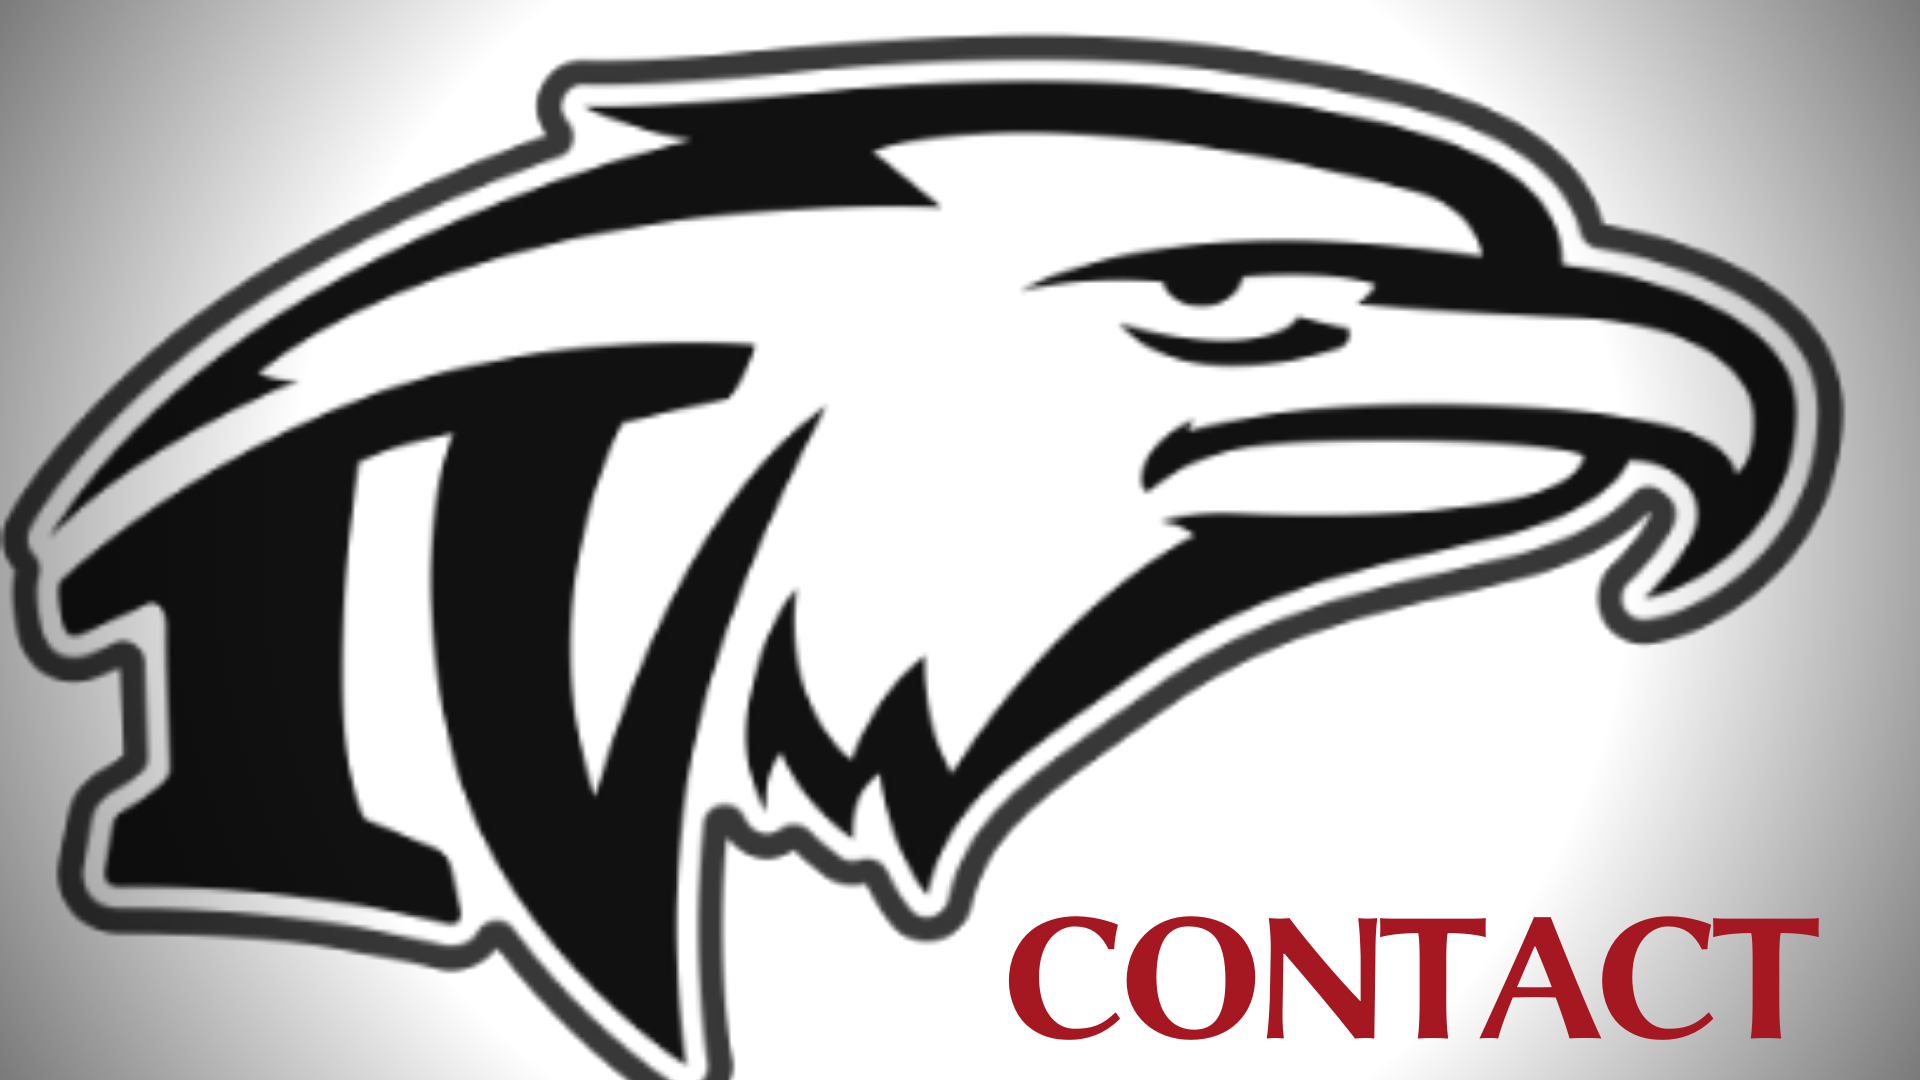 IVAS Contact